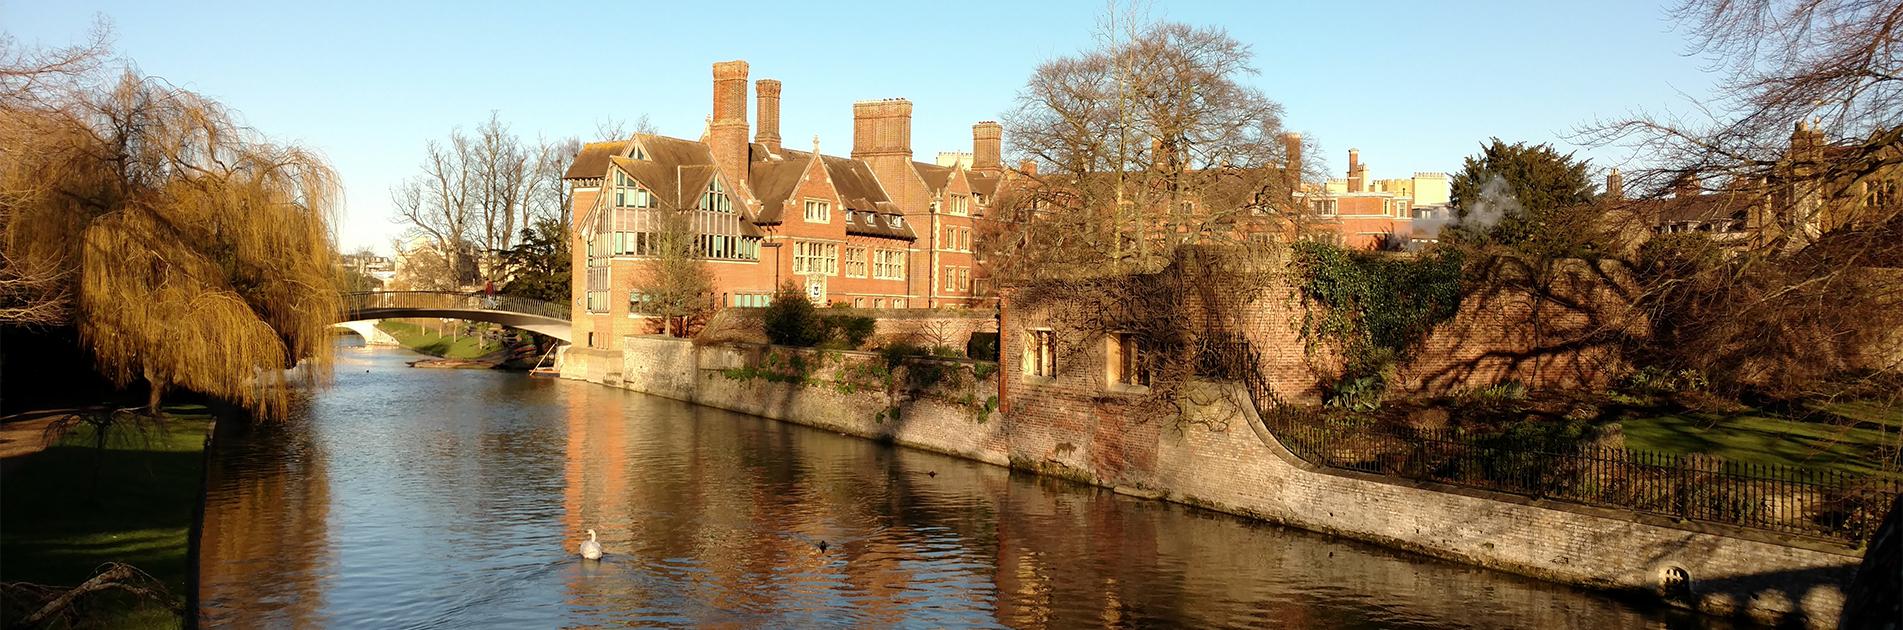 Kanal i Cambridge